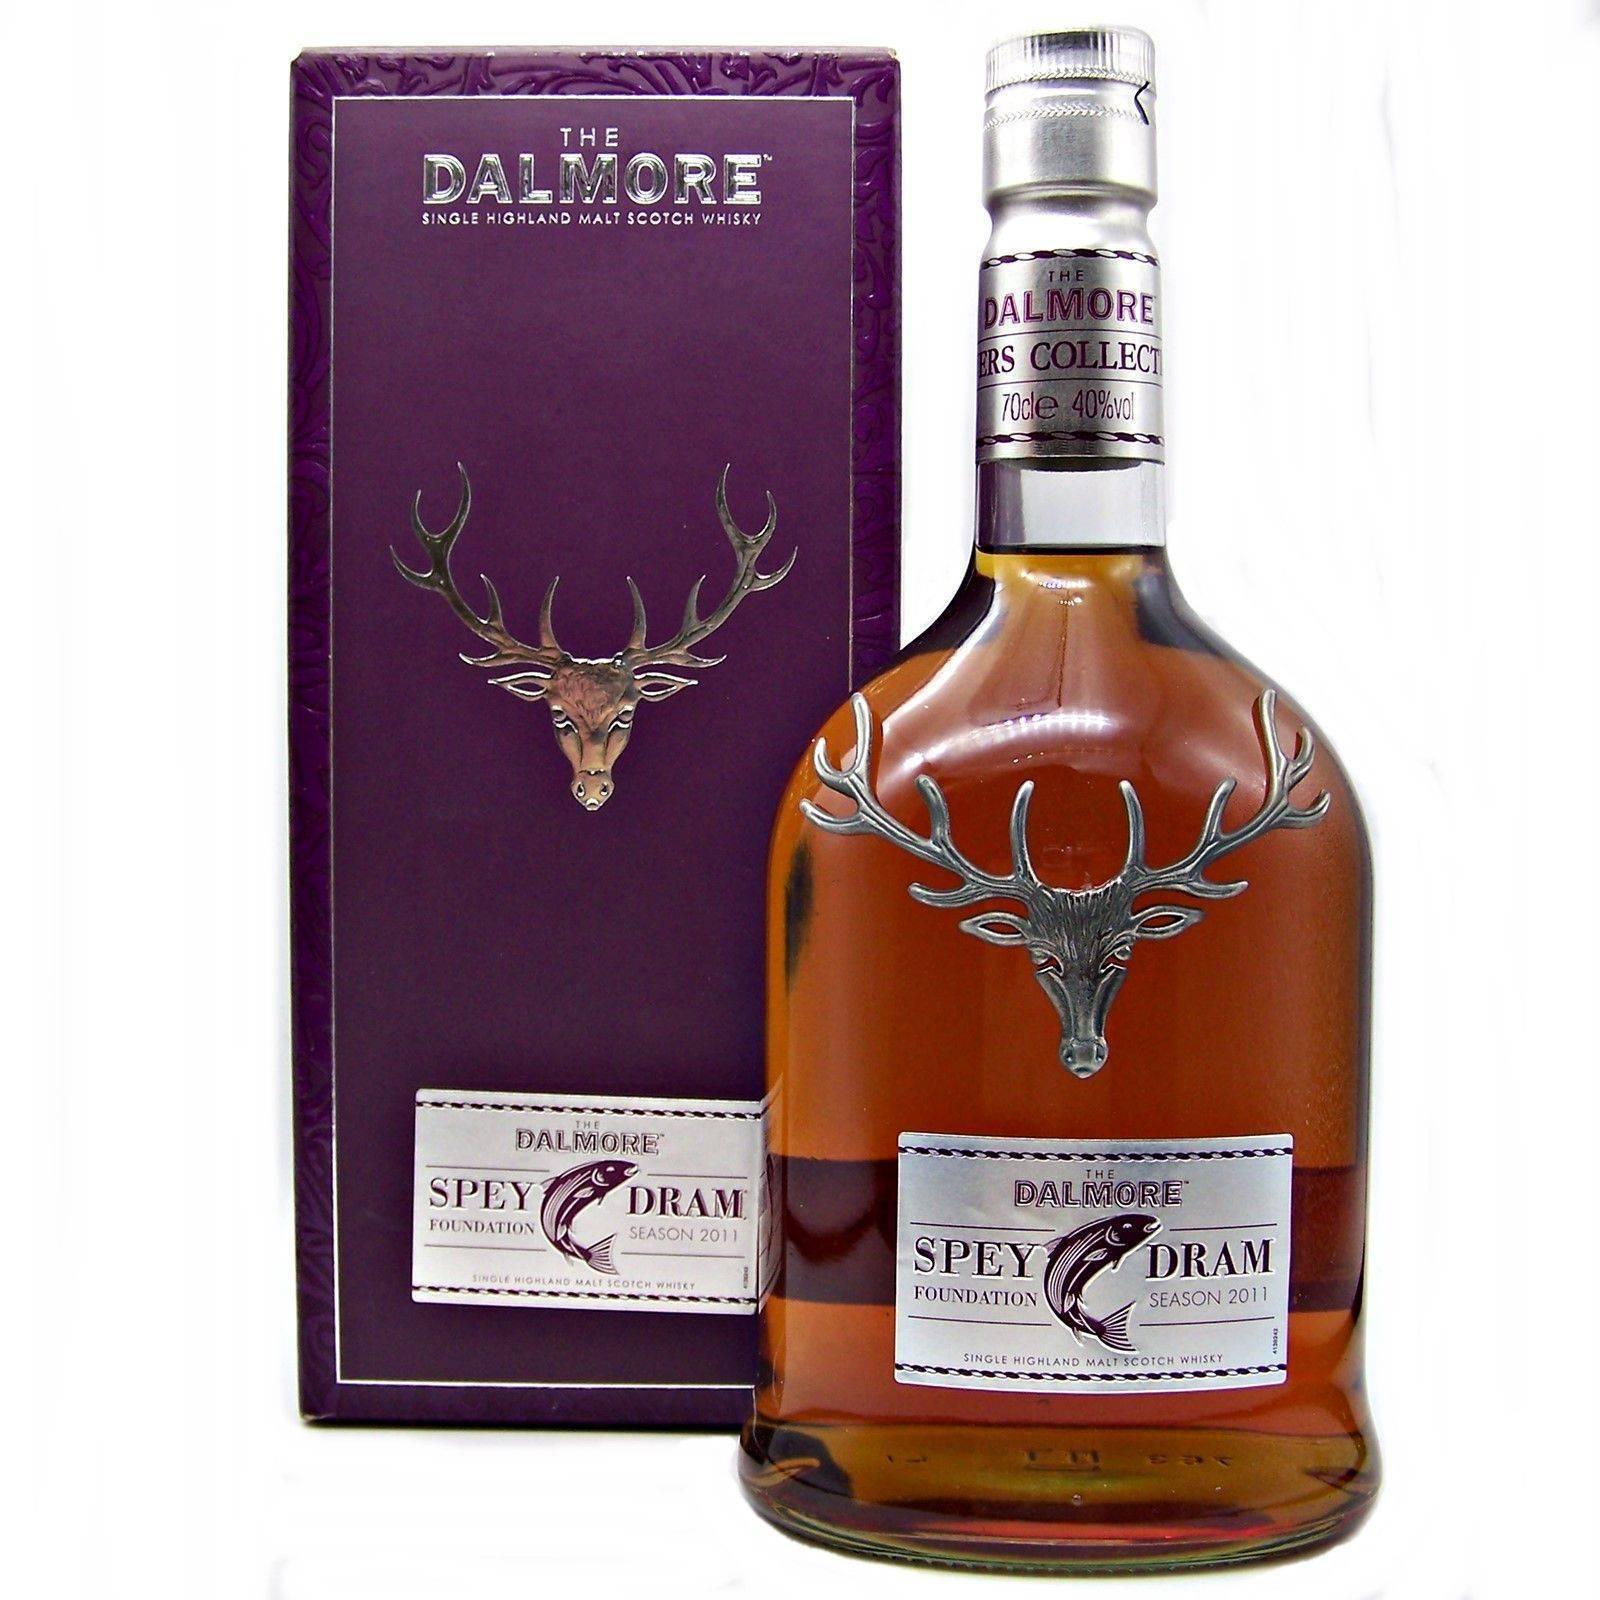 Виски далмор (dalmore) — состав и особенности производства напитка